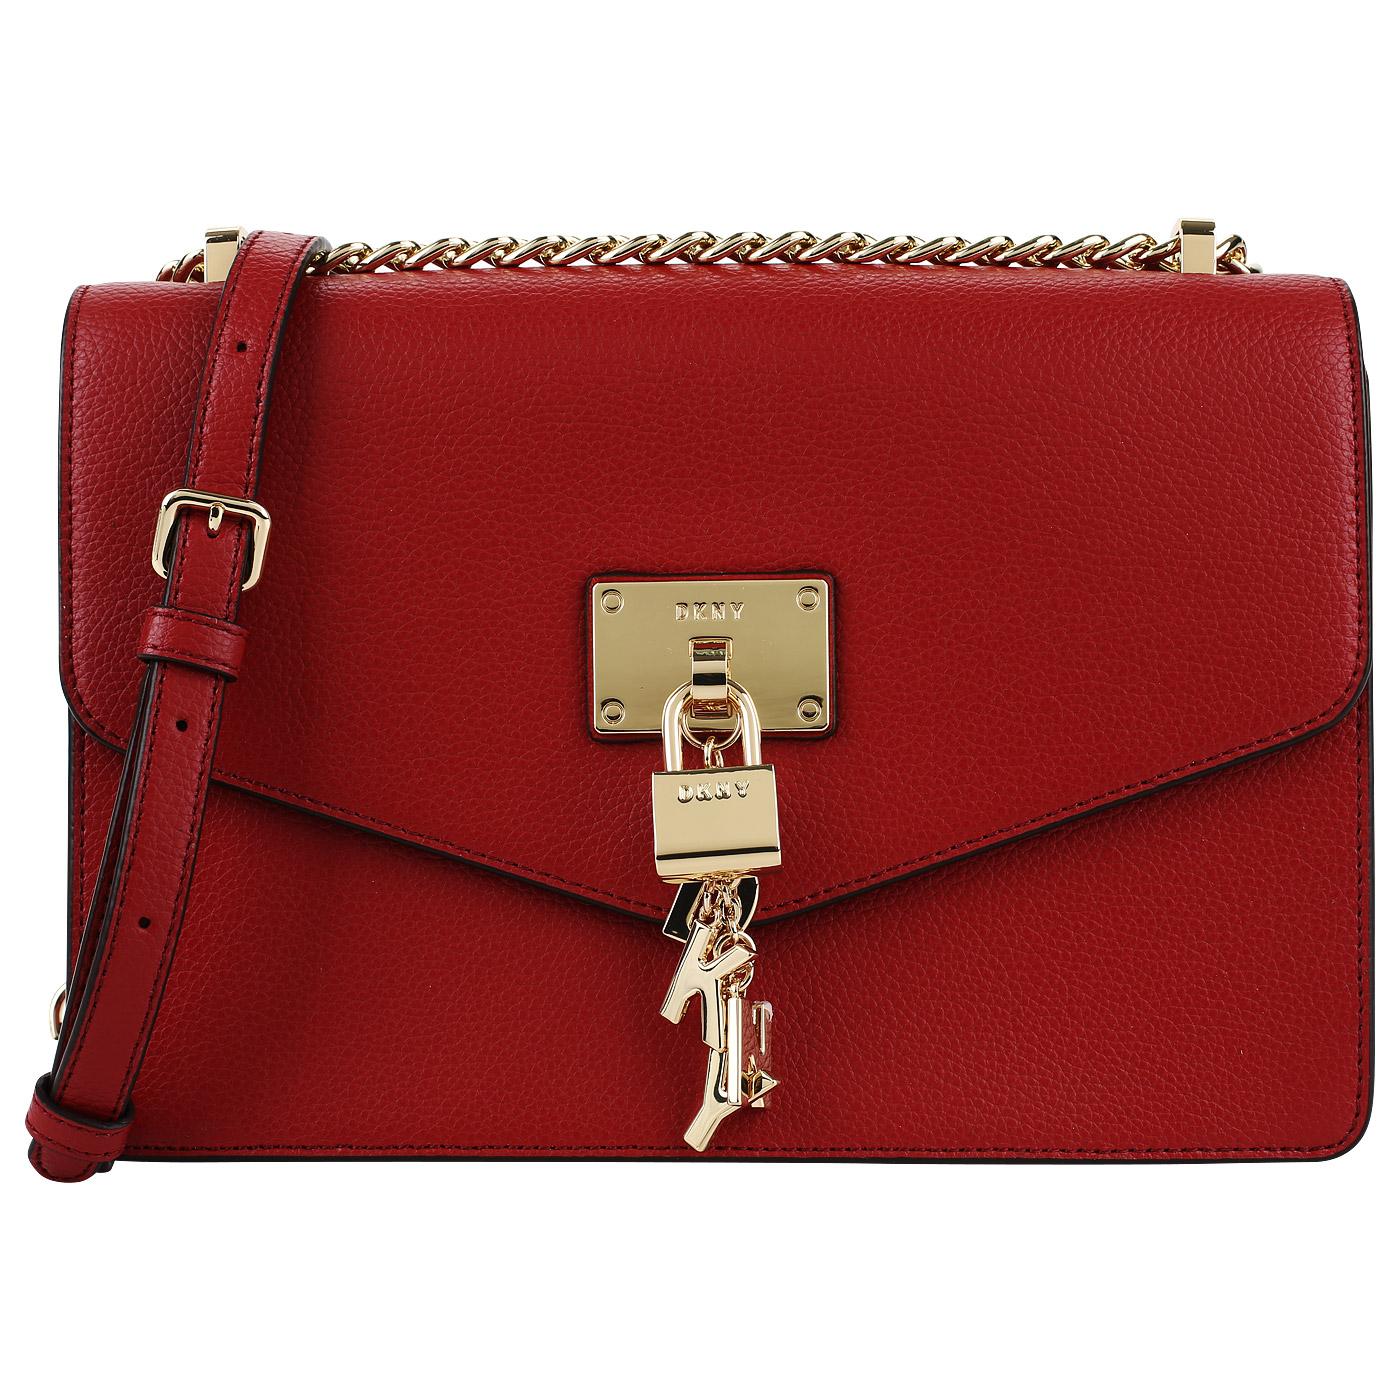 552e0cdbccde Красная кожаная сумка DKNY Elissa Красная кожаная сумка DKNY Elissa ...